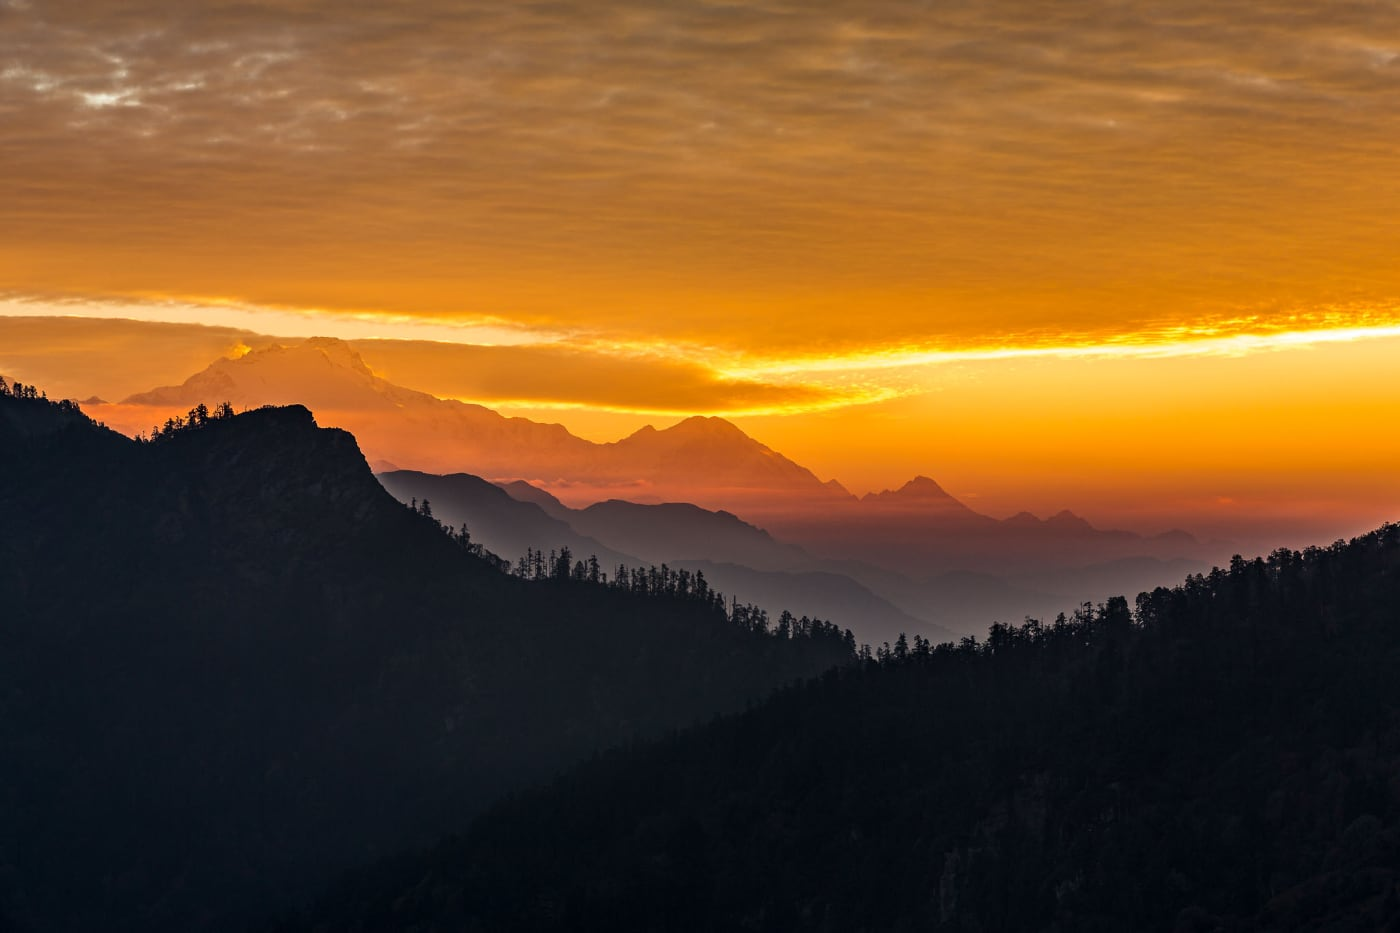 foto: © De Fotoreisshop - oranje zonsondergang bergen